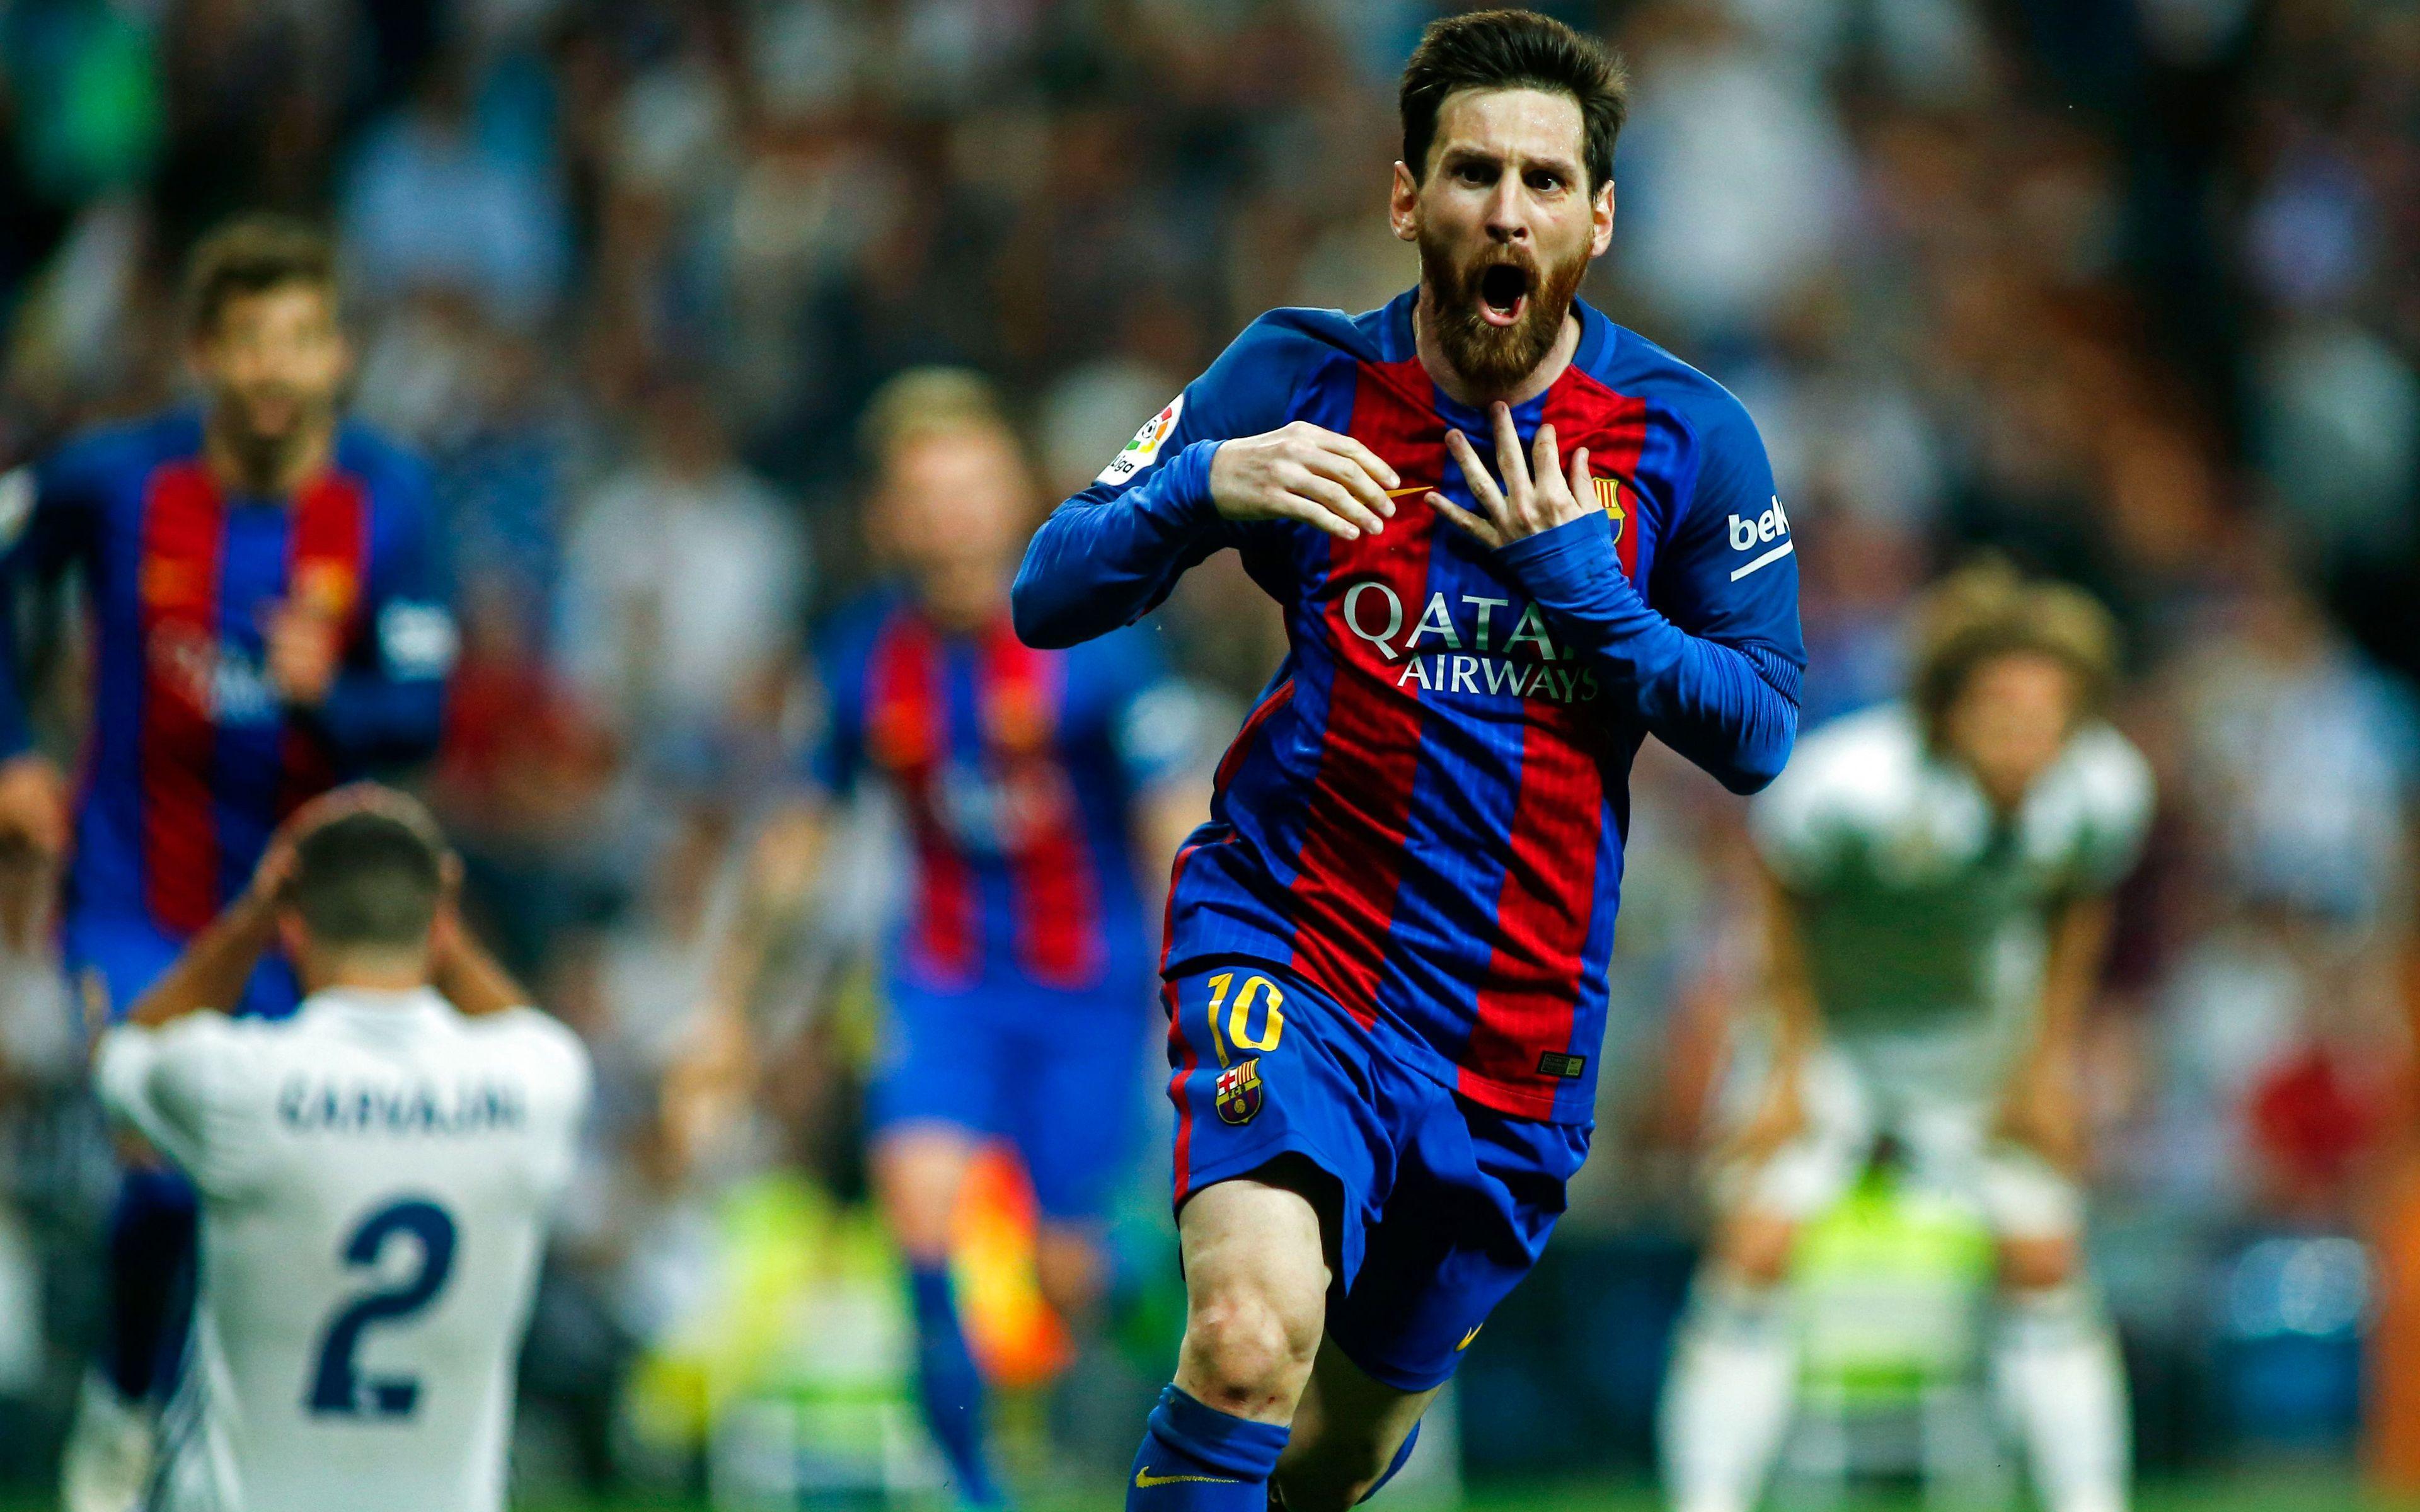 Download Lionel Messi Footballer 1440x900 Resolution, HD 4K Wallpapers